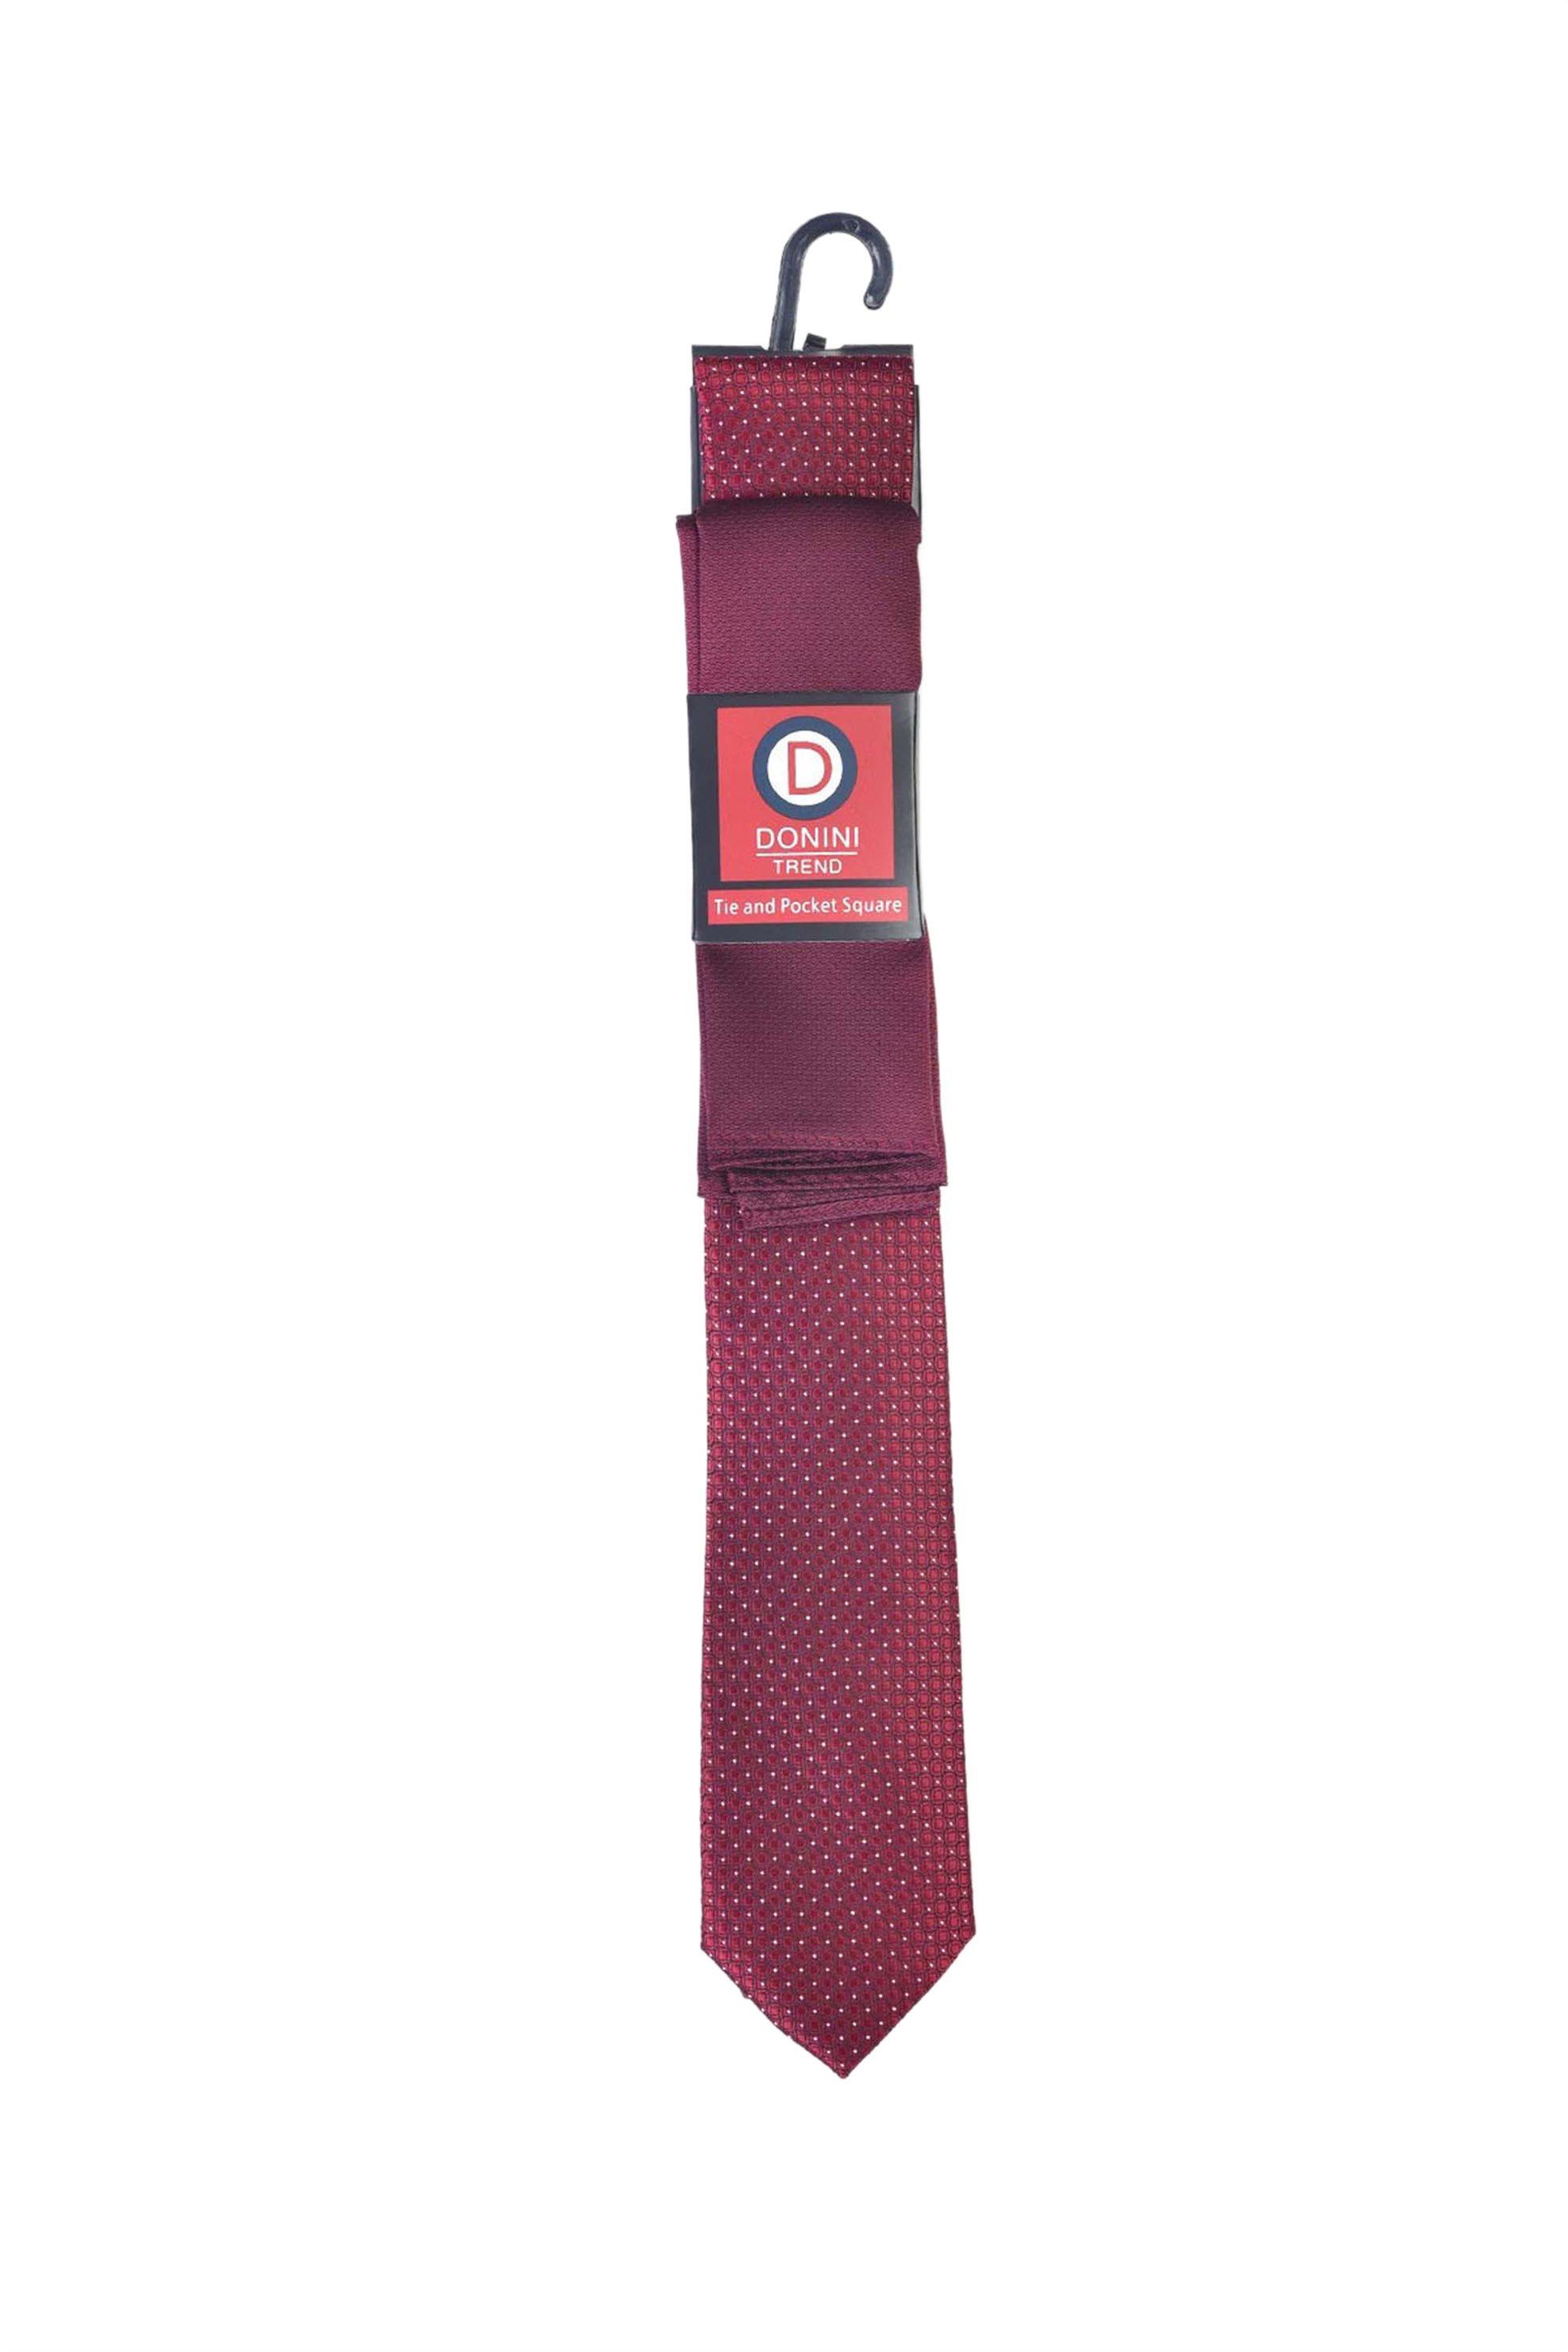 Vardas ανδρικό σετ γραβάτα και μαντηλάκι - 2062000414201 - Μπορντό